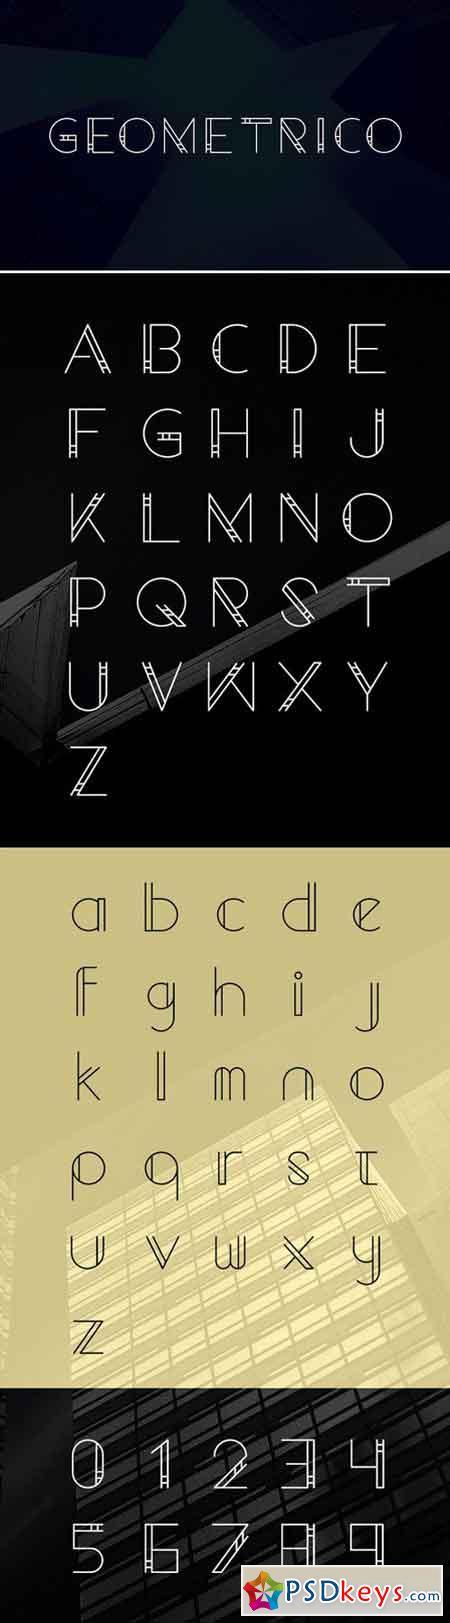 Geometrico font